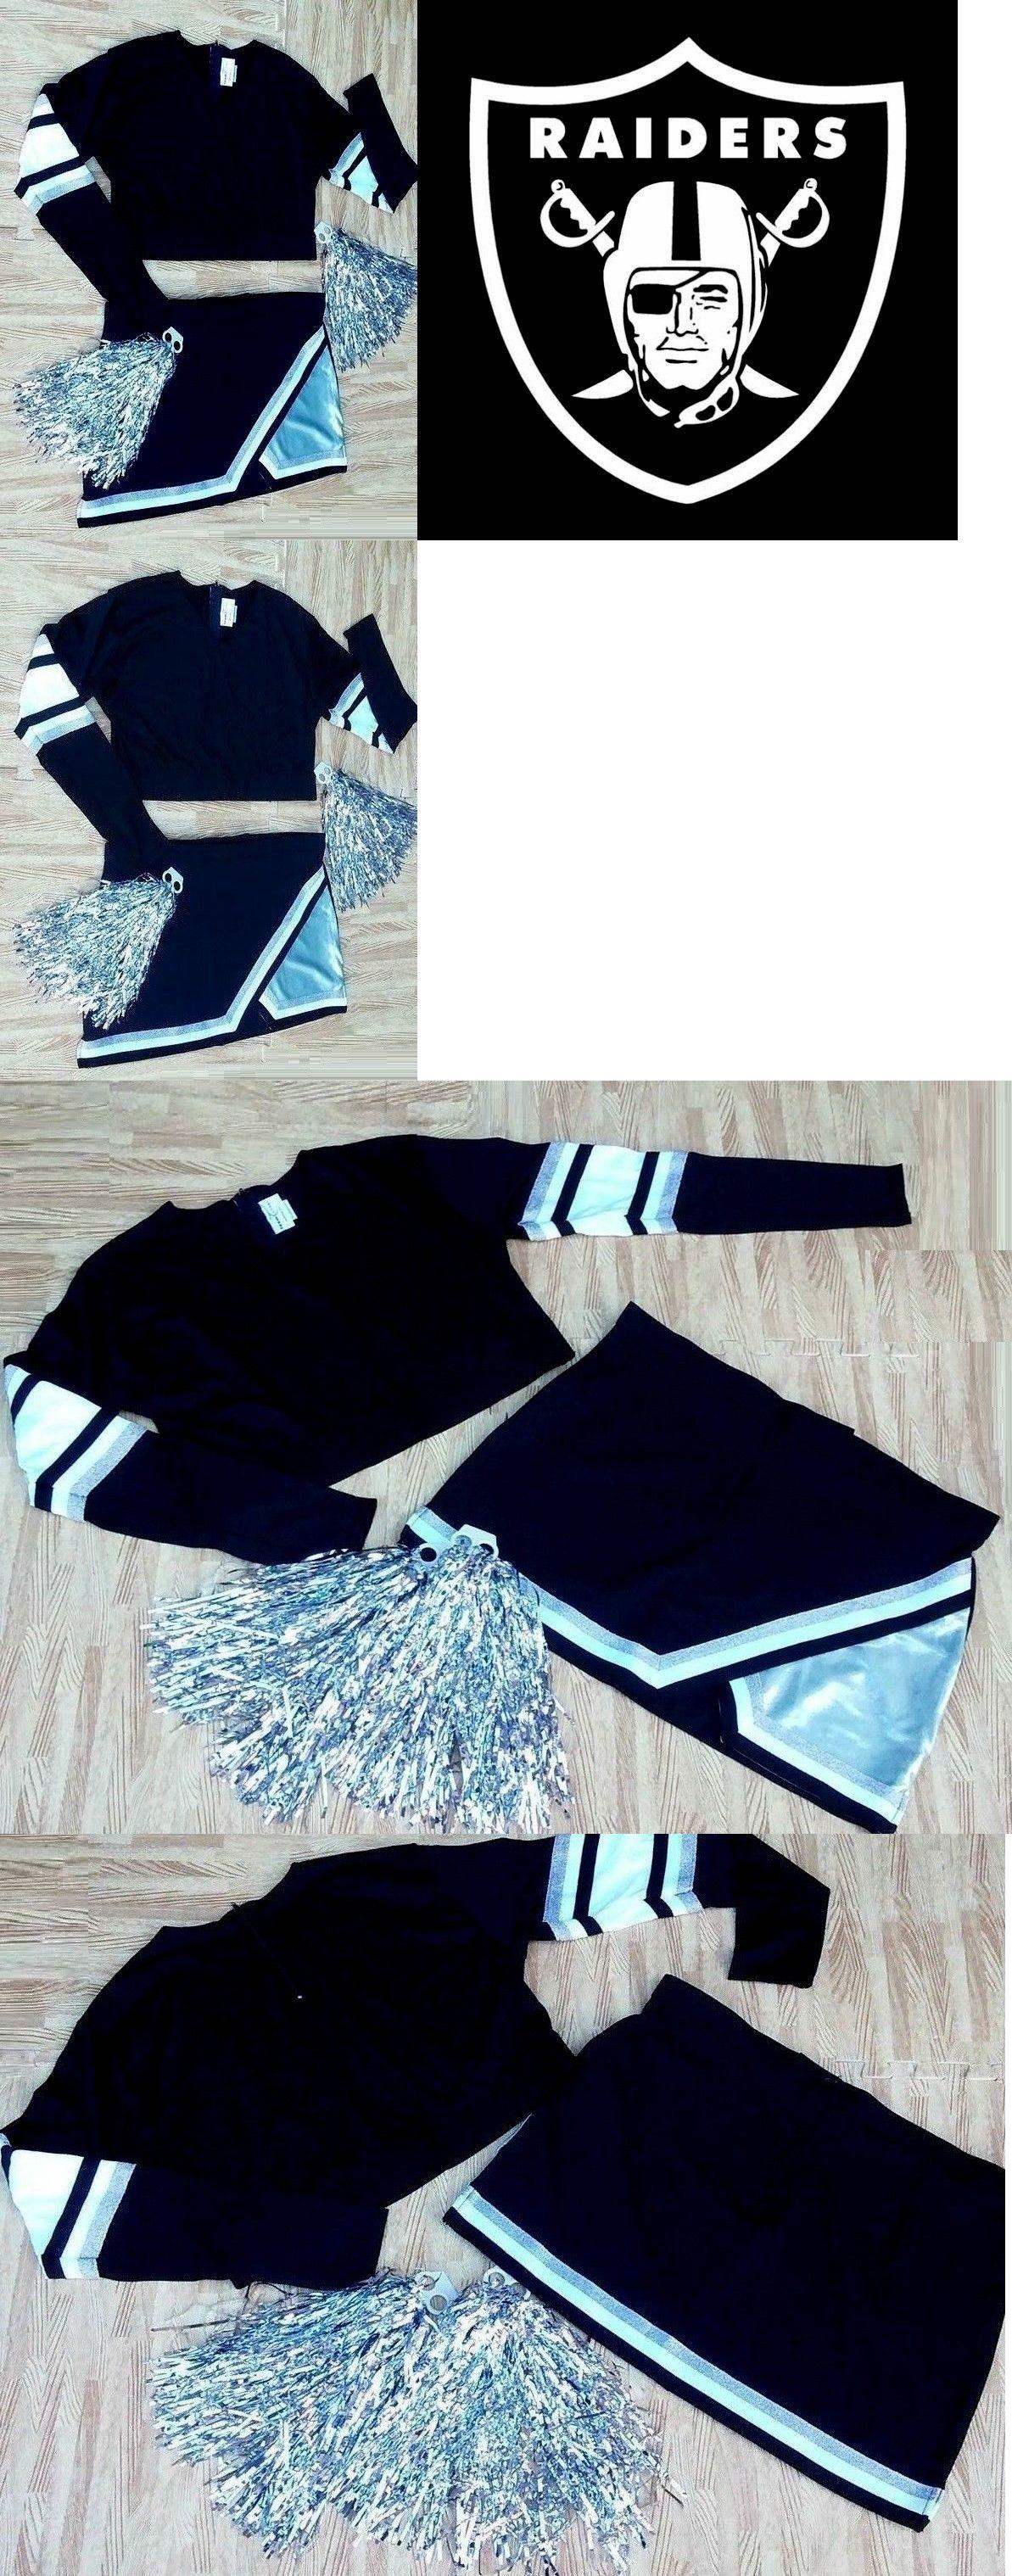 6bc9a4b5630 Cheerleading 66832  Adult Xxl Black Silver Cheerleader Uniform Top Skirt  Poms 46-49 38-40 Raiders -  BUY IT NOW ONLY   39 on  eBay  cheerleading   adult .